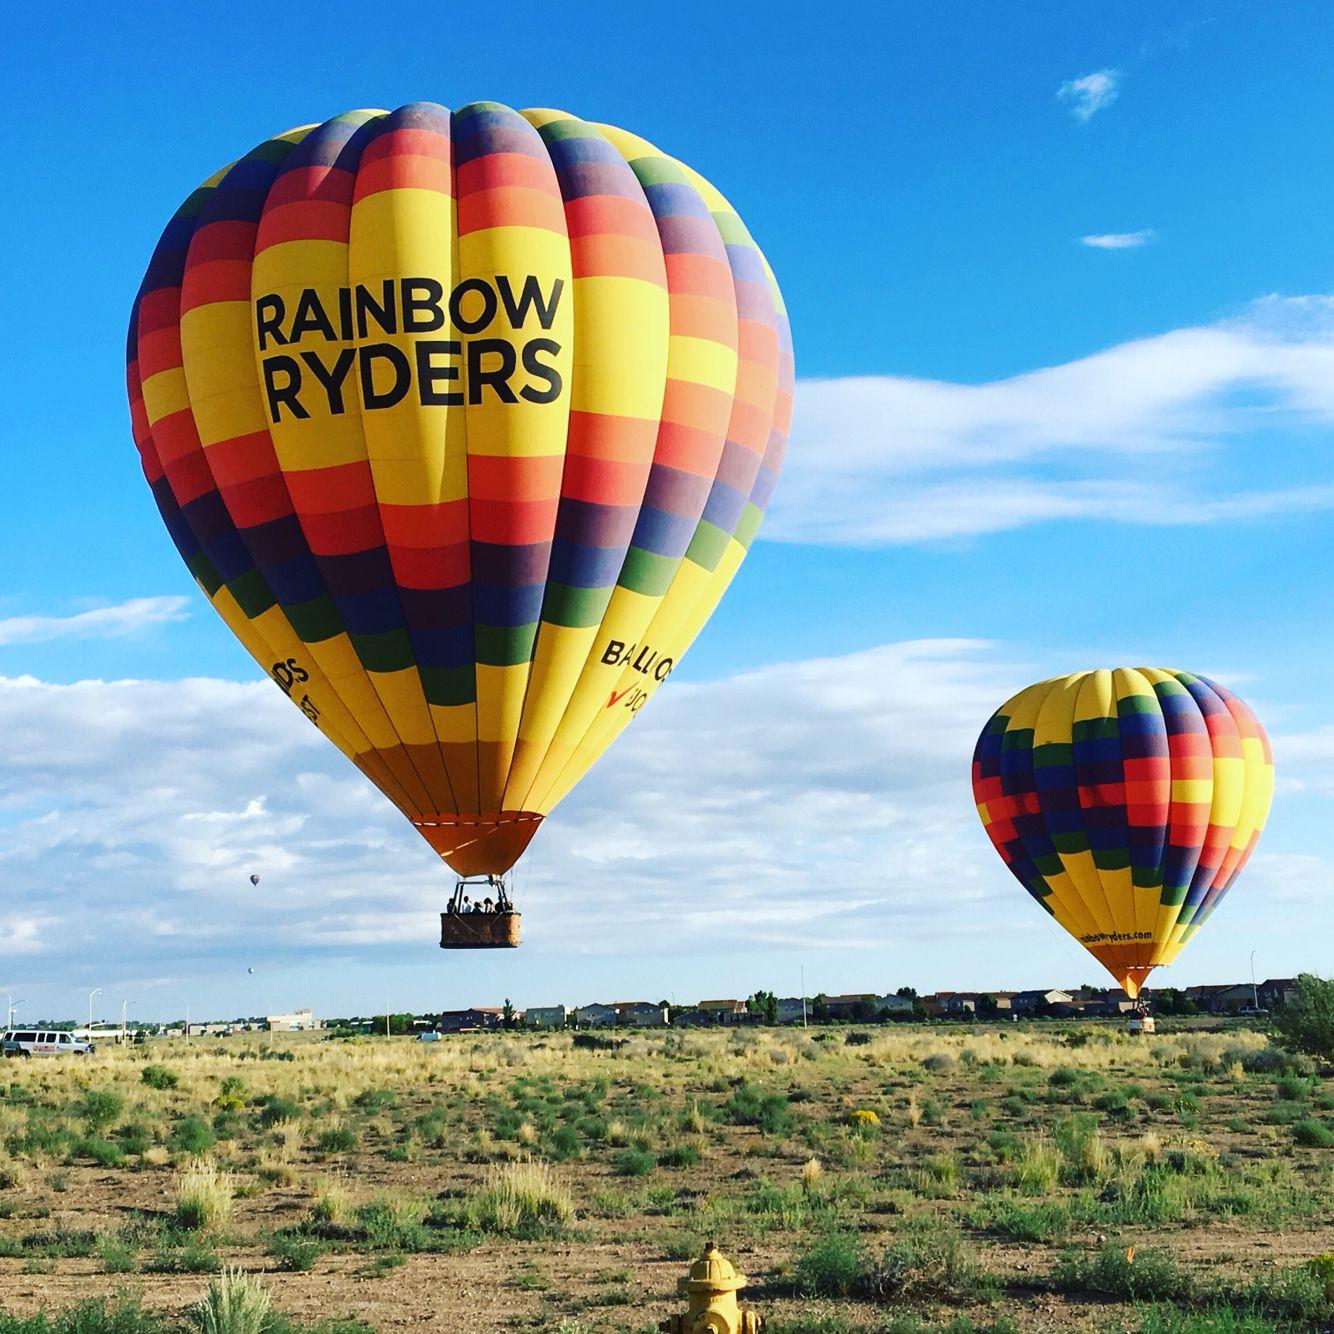 chasingtherainbow rainbowryders newmexicotrue 505 abq